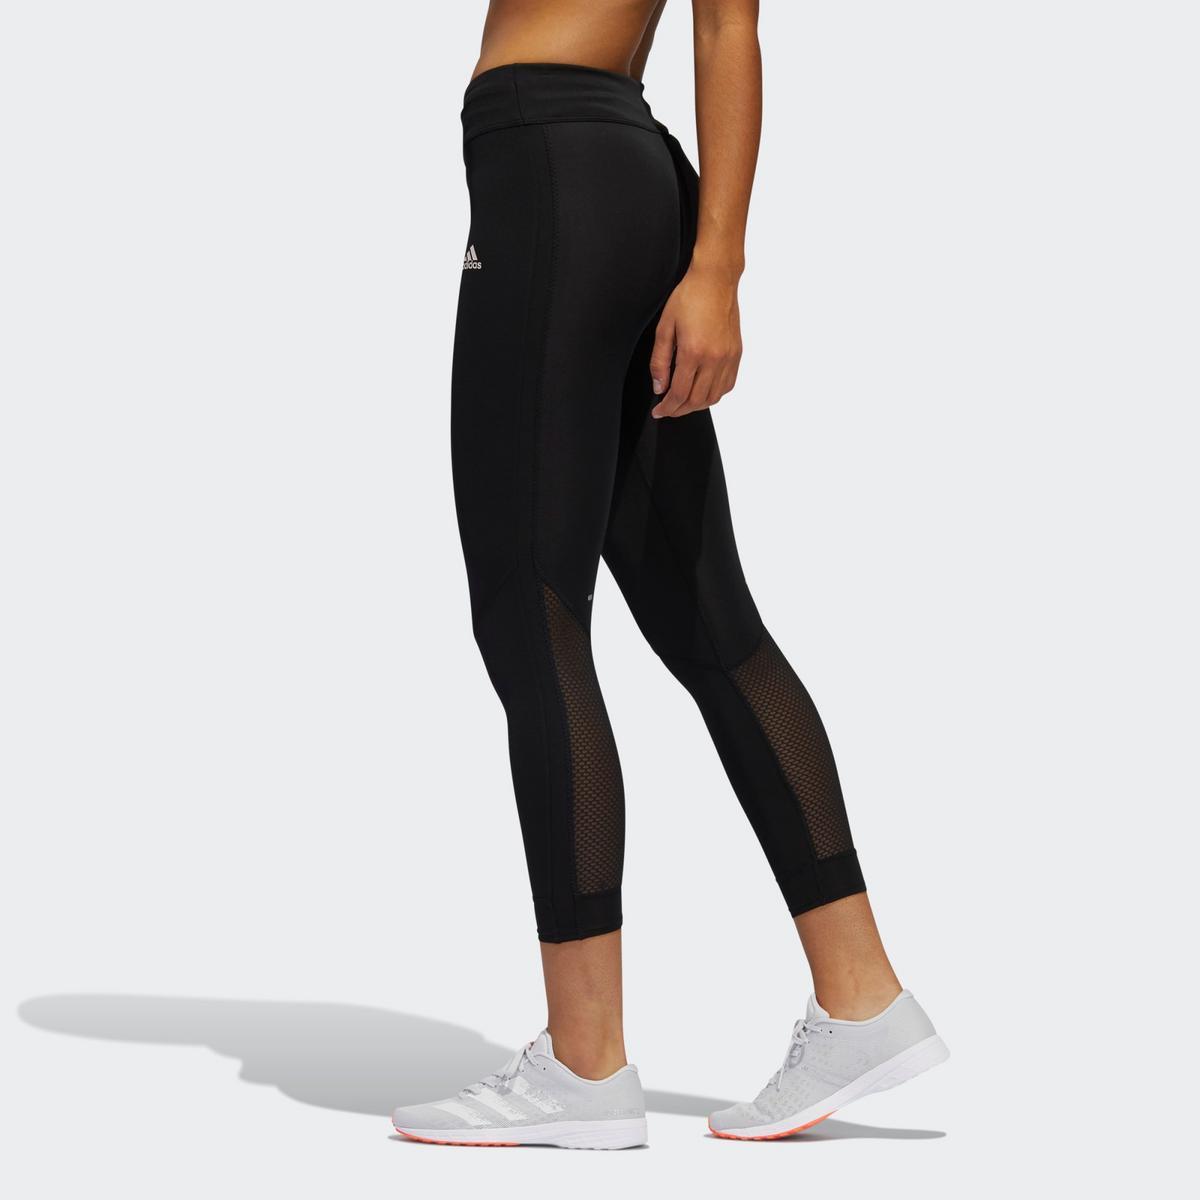 Adidas Women's Own The Run 3 Stripes Fast Leggings - Black